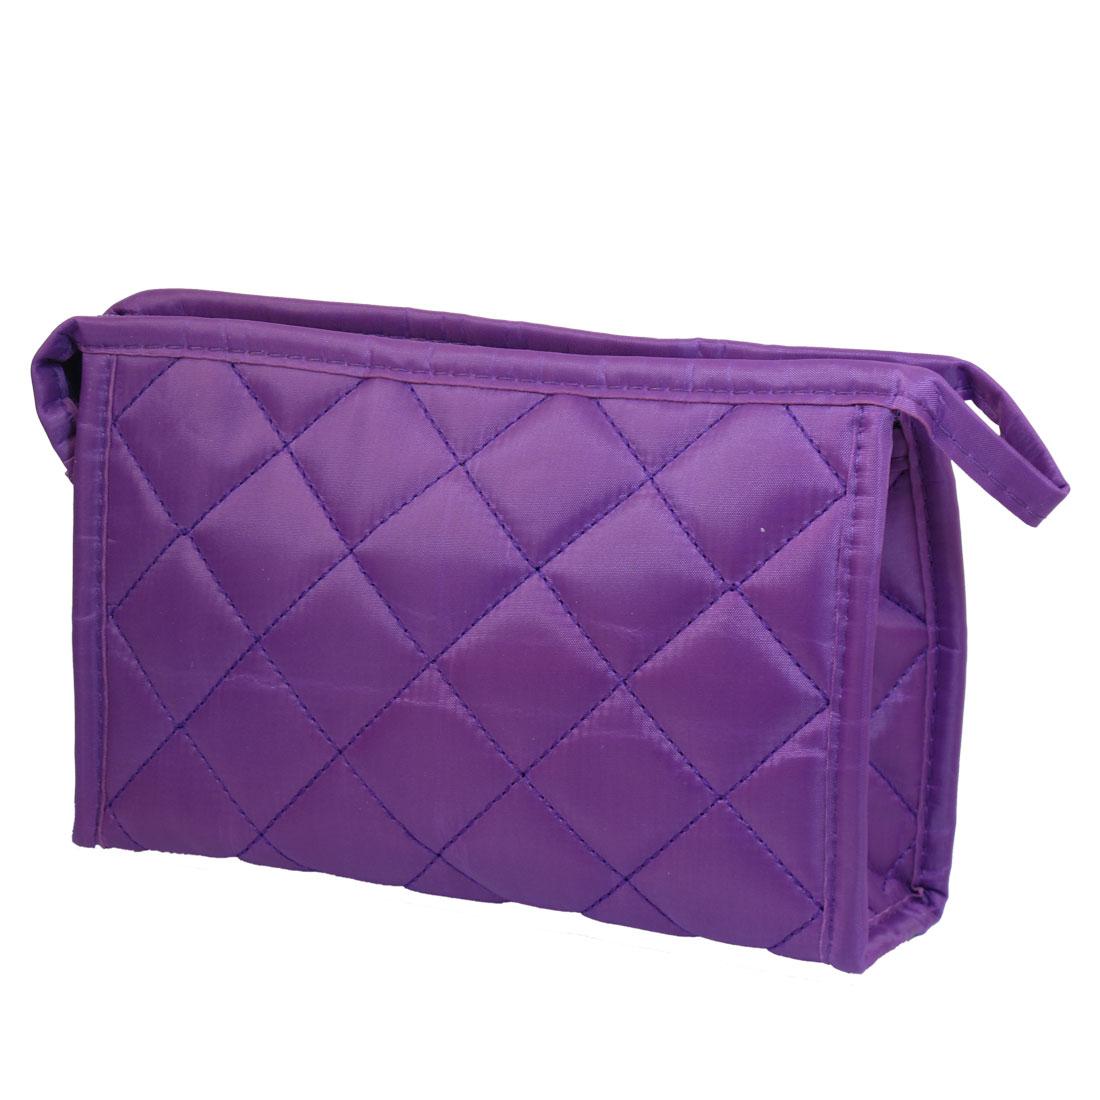 Las Women Purple Cosmetic Zippered Purse Makeup Bag Holder 7 5 X 1